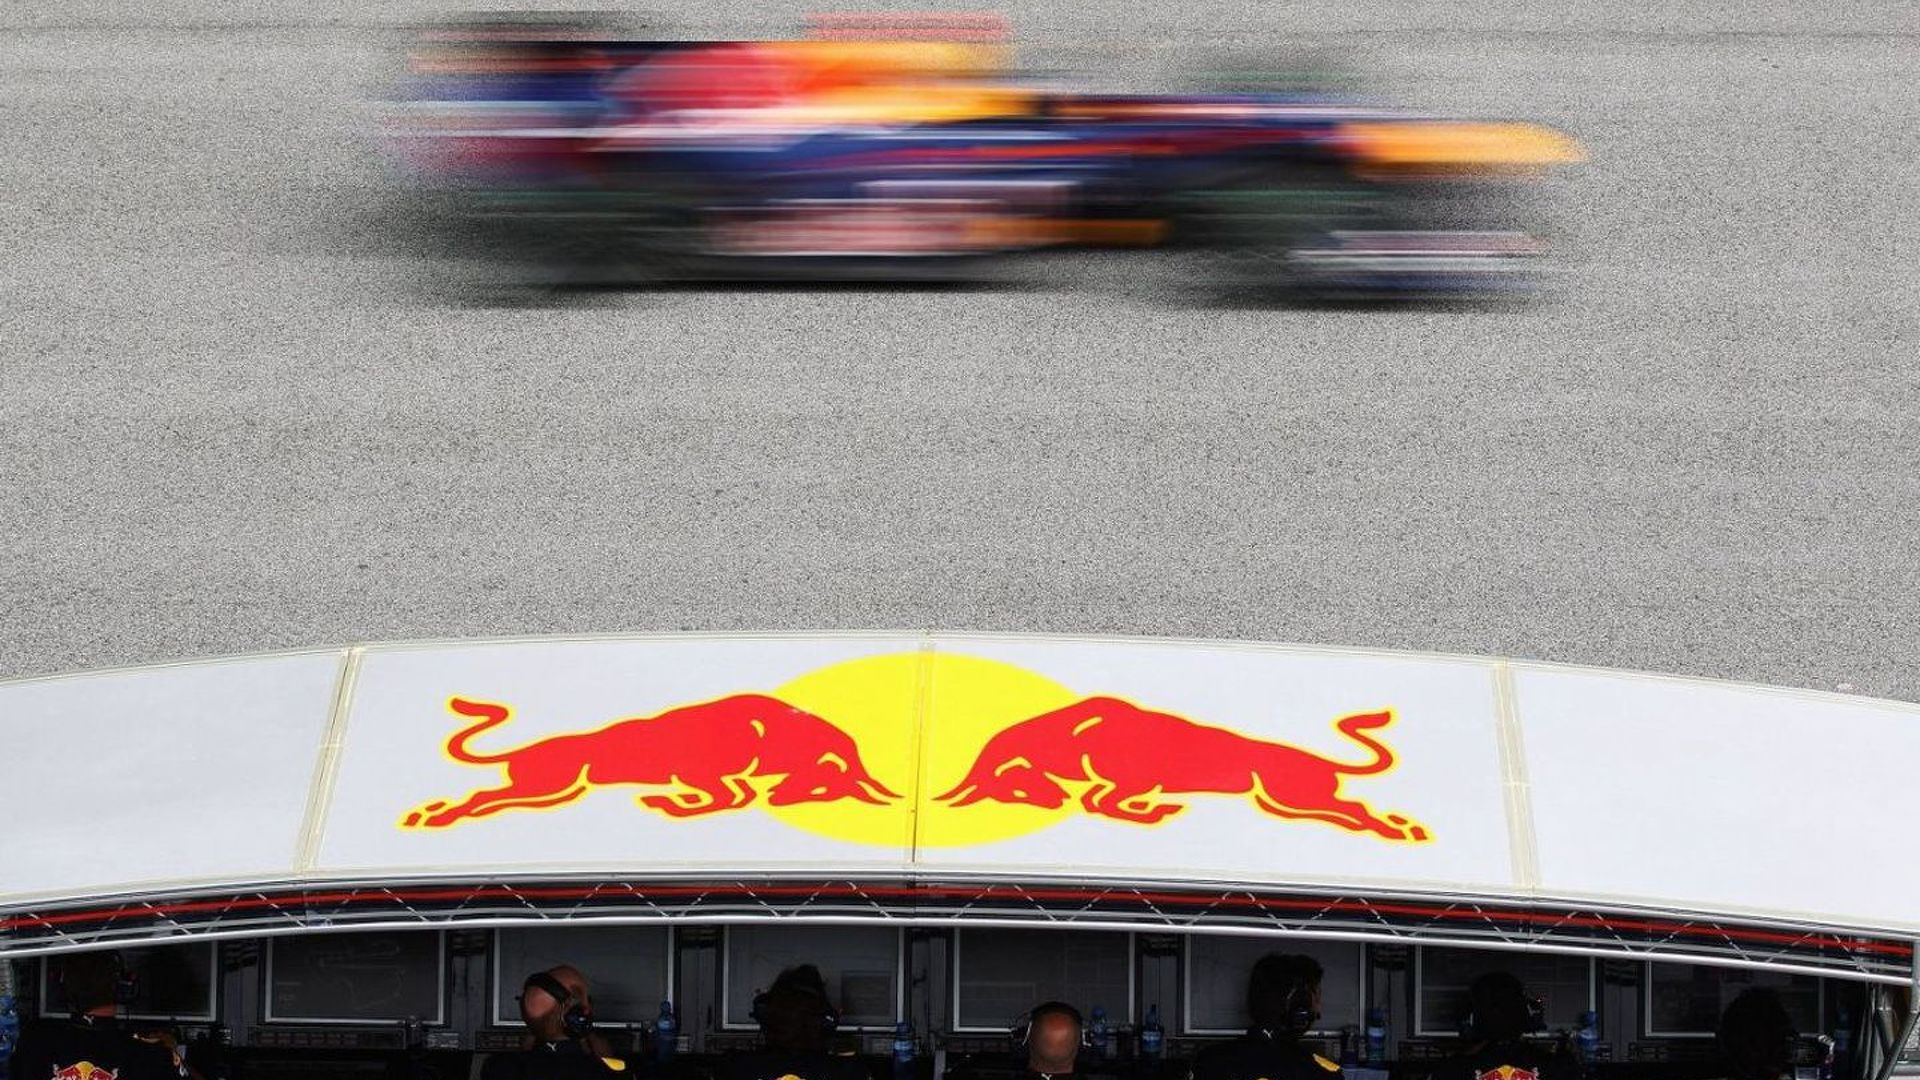 British bank eyes Red Bull sponsor deal - report